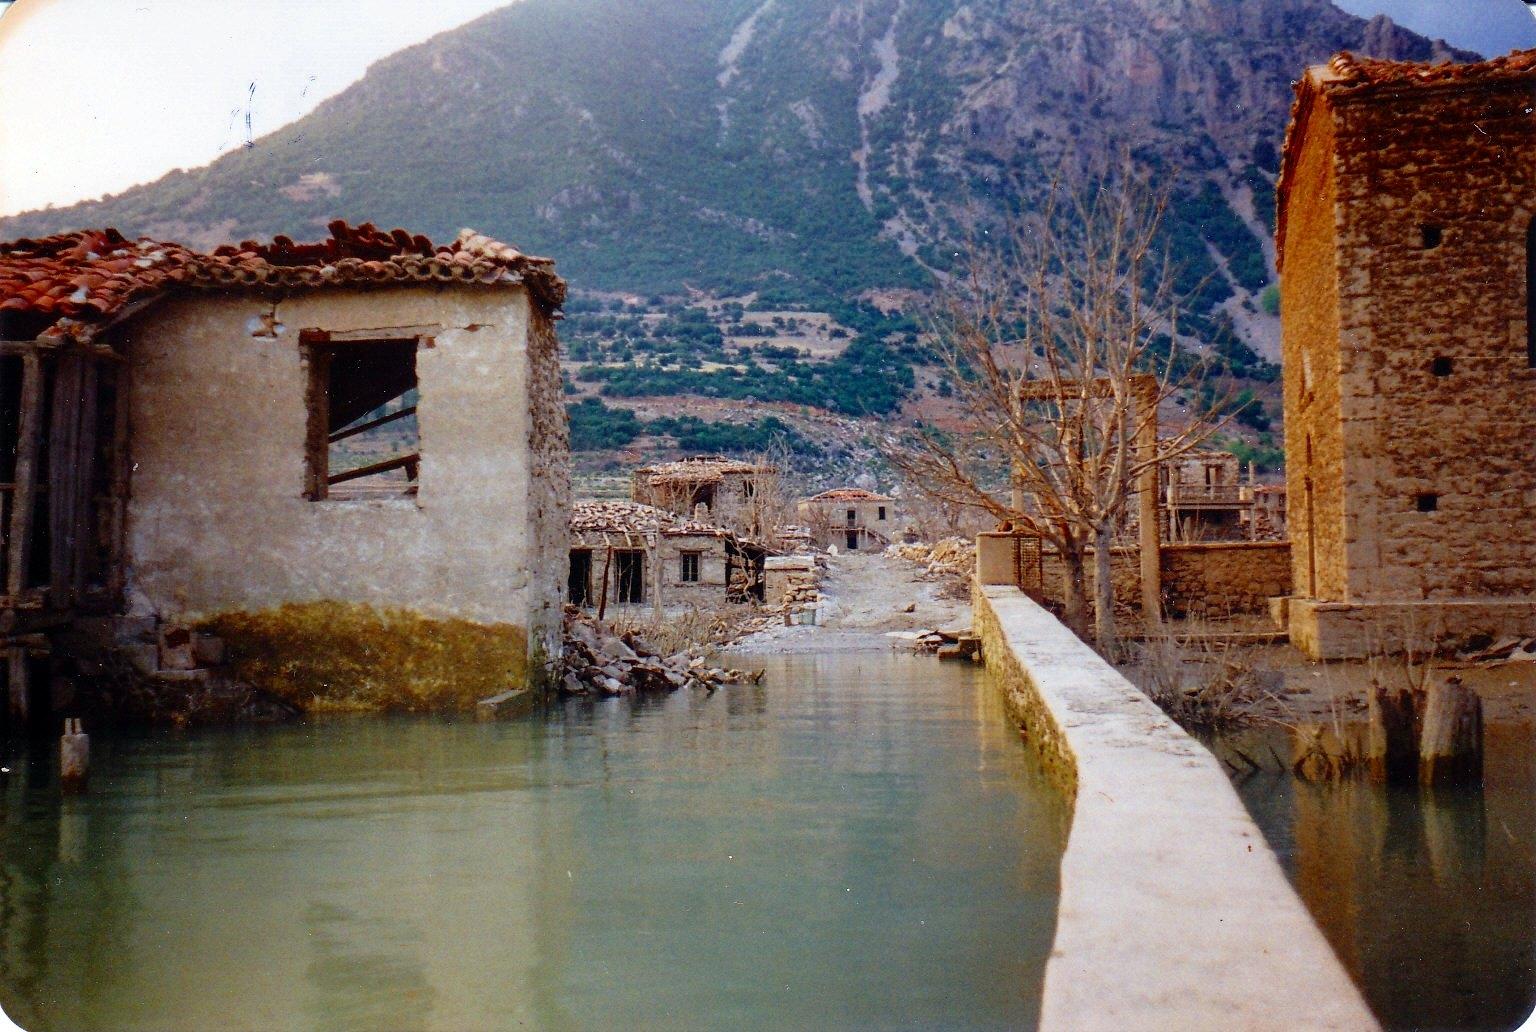 Kάλλιο, το χωριό που βυθίστηκε για να λυθεί το πρόβλημα ύδρευσης της Αθήνας. Εκεί βρισκόταν η αρχαία Καλλίπολις που καταστράφηκε από τους Γαλάτες